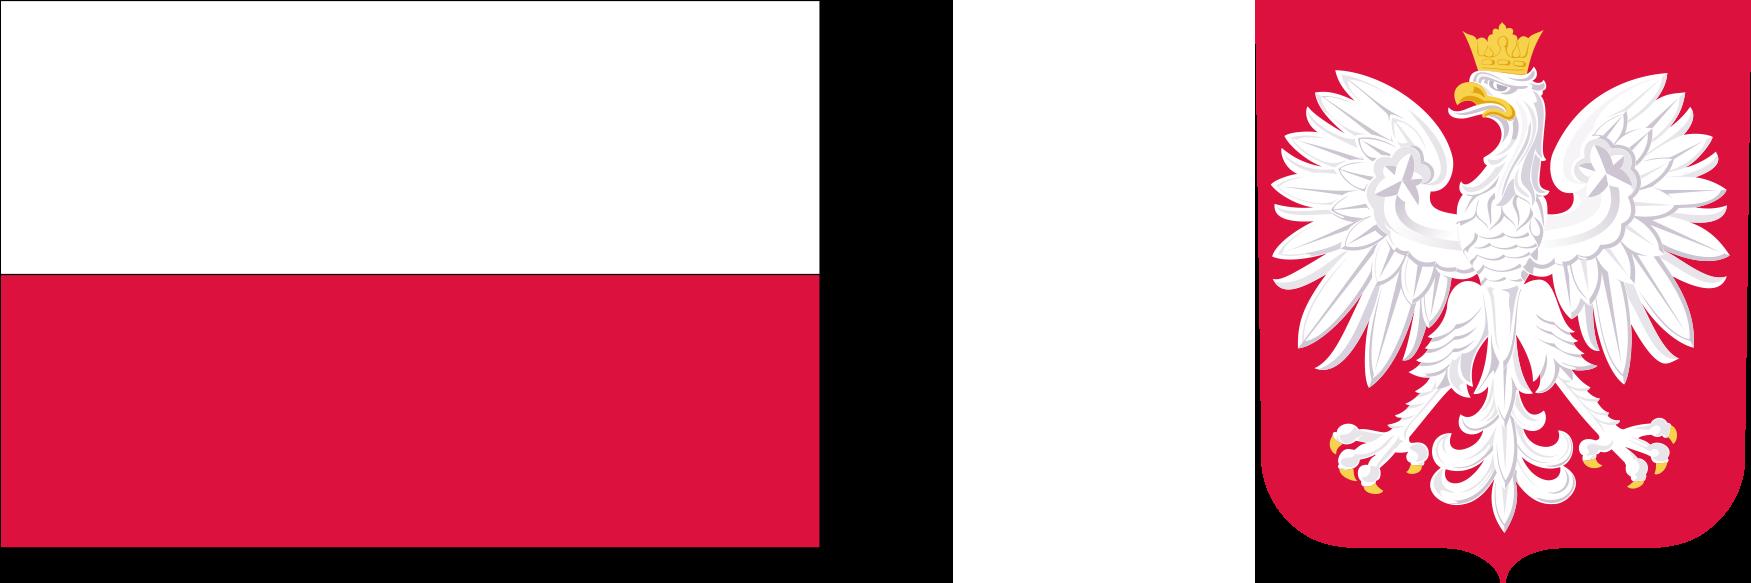 Polska - flaga, godło